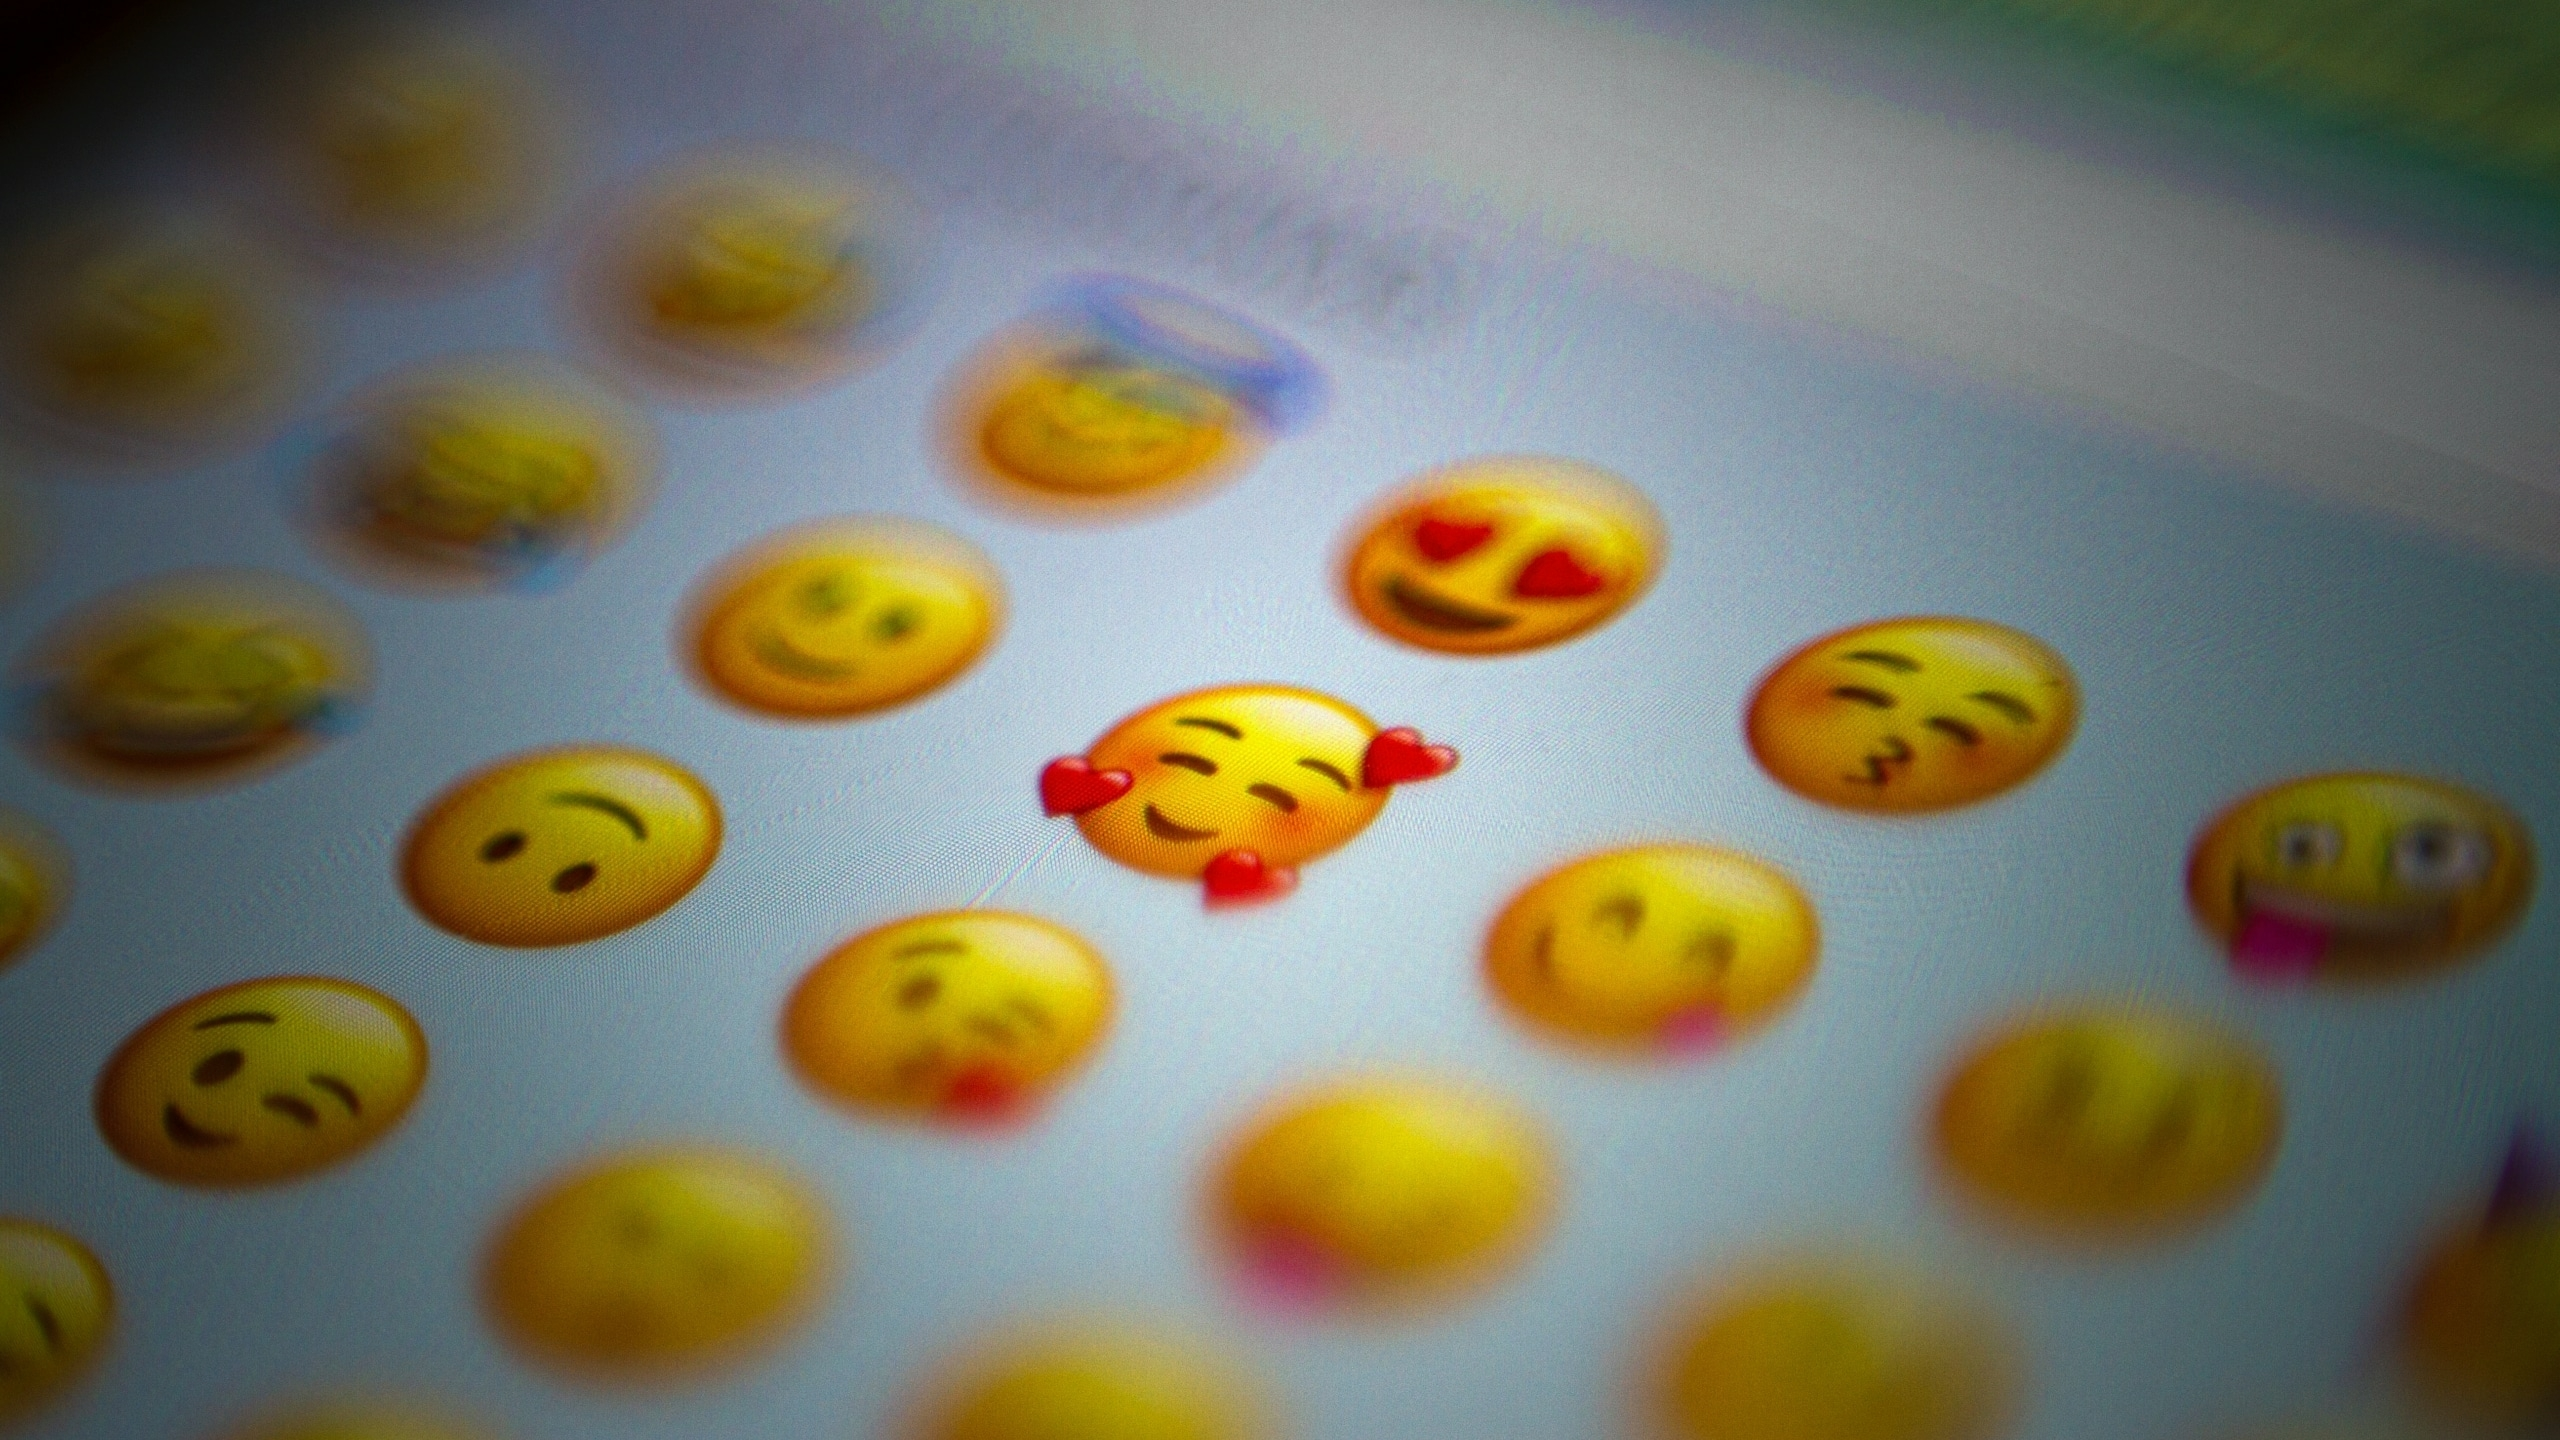 gevoelens emoji emojis